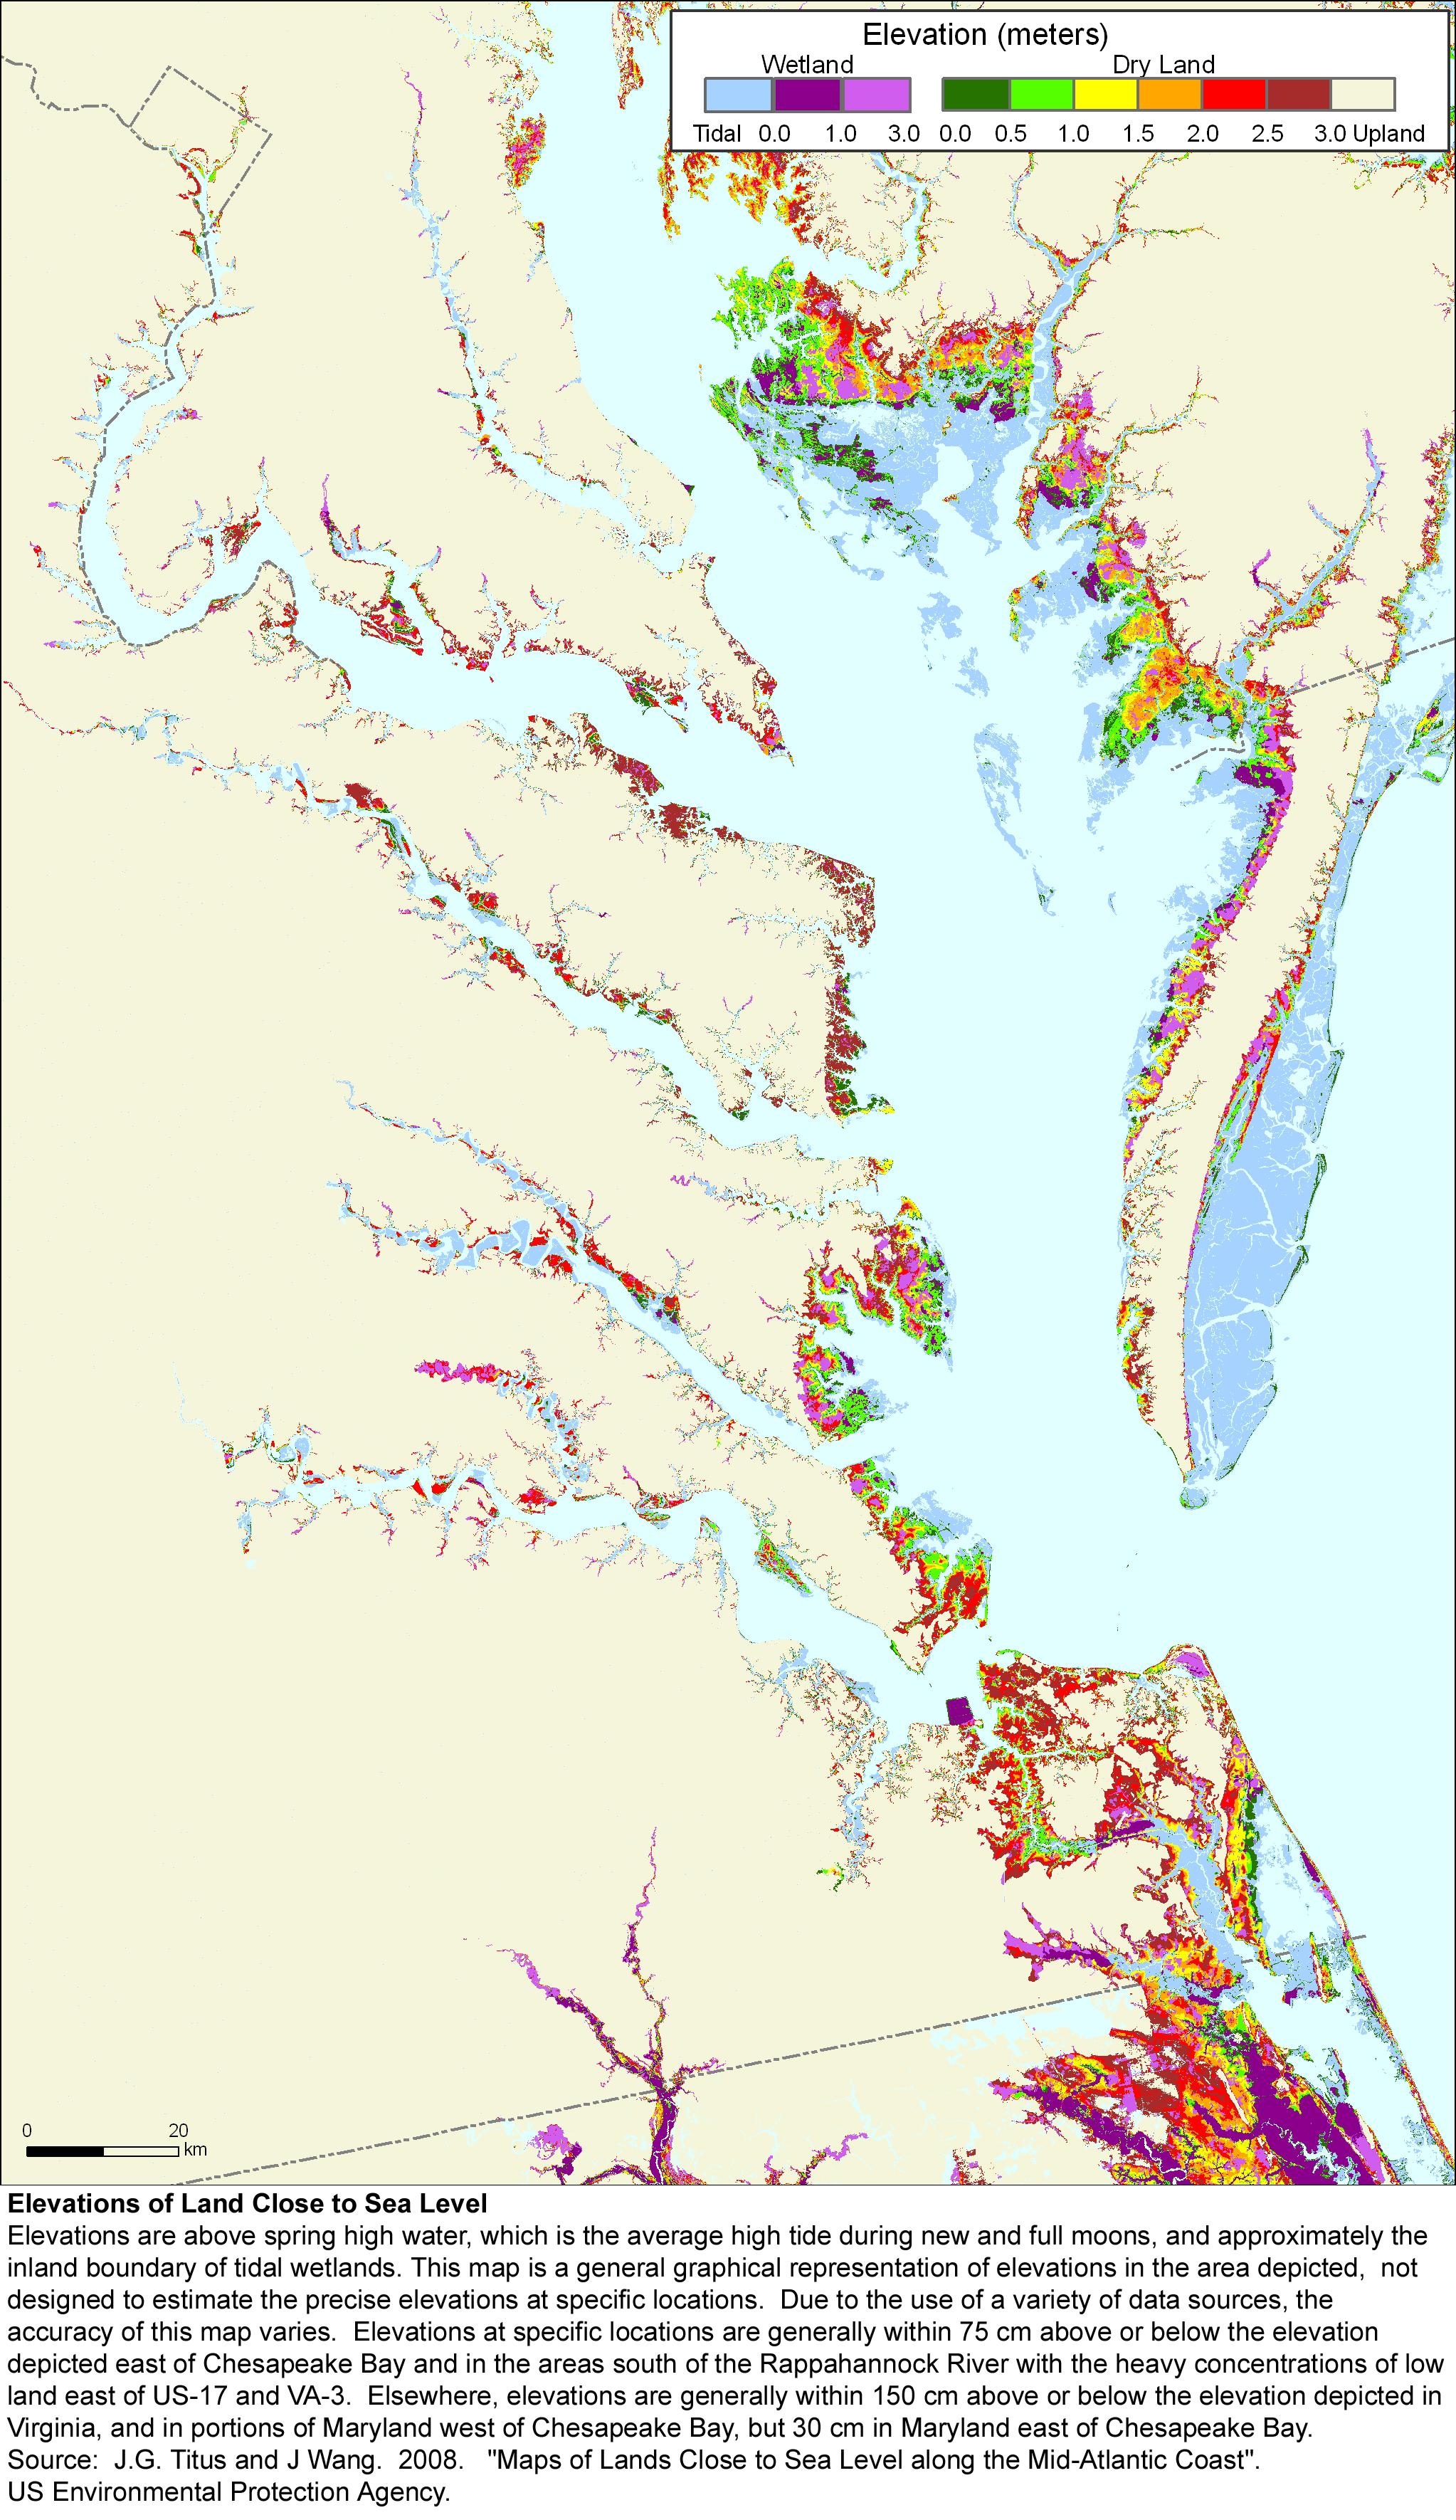 More Sea Level Rise Maps for Virginia